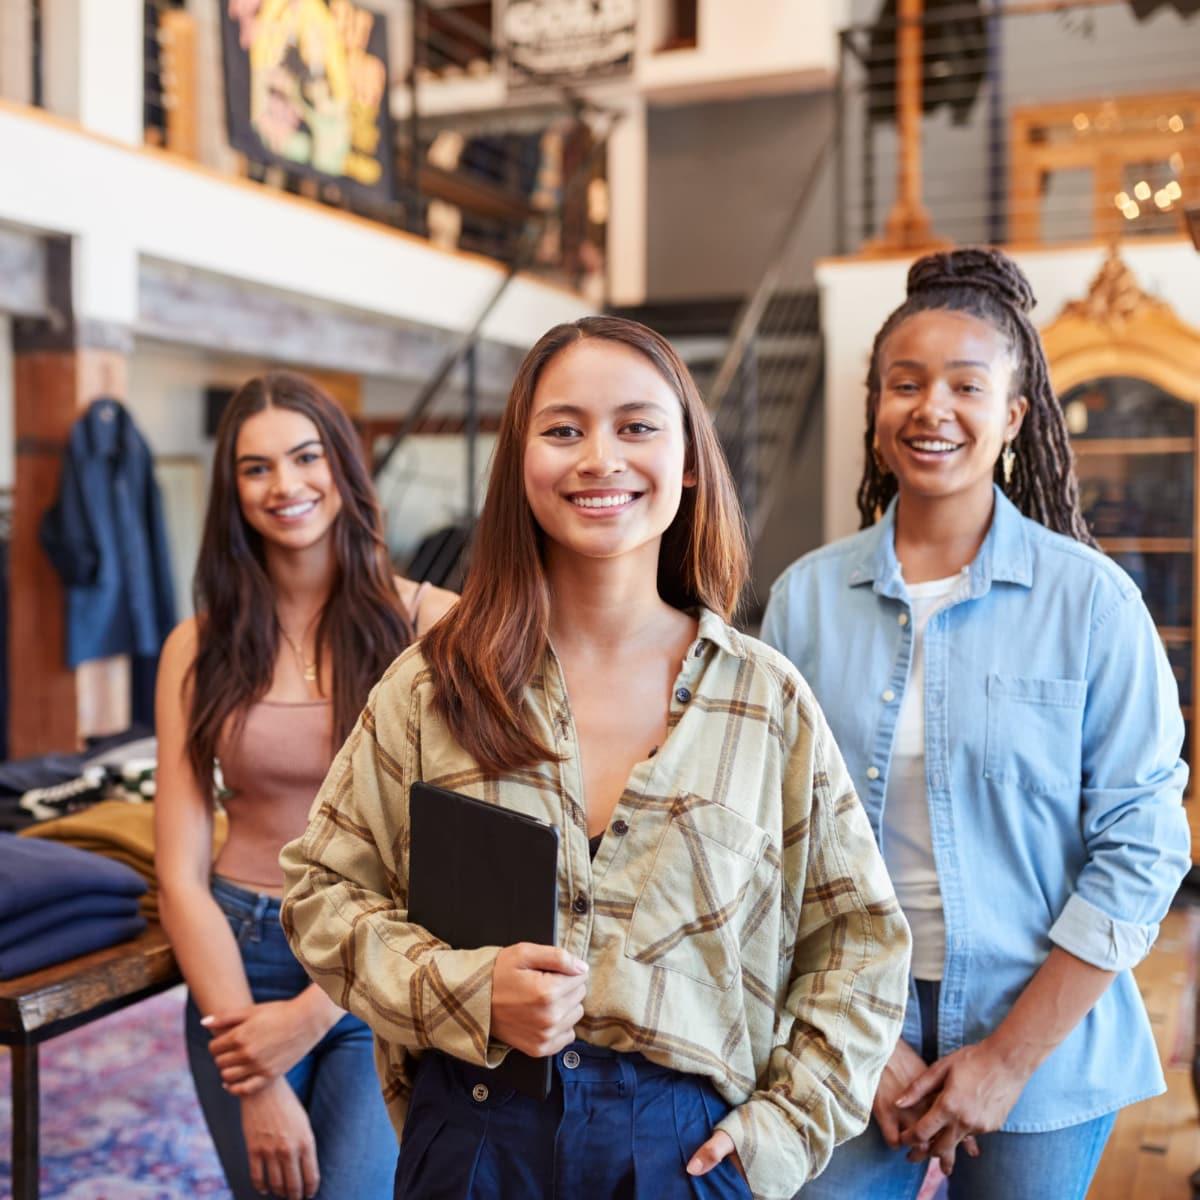 three women working in clothing store